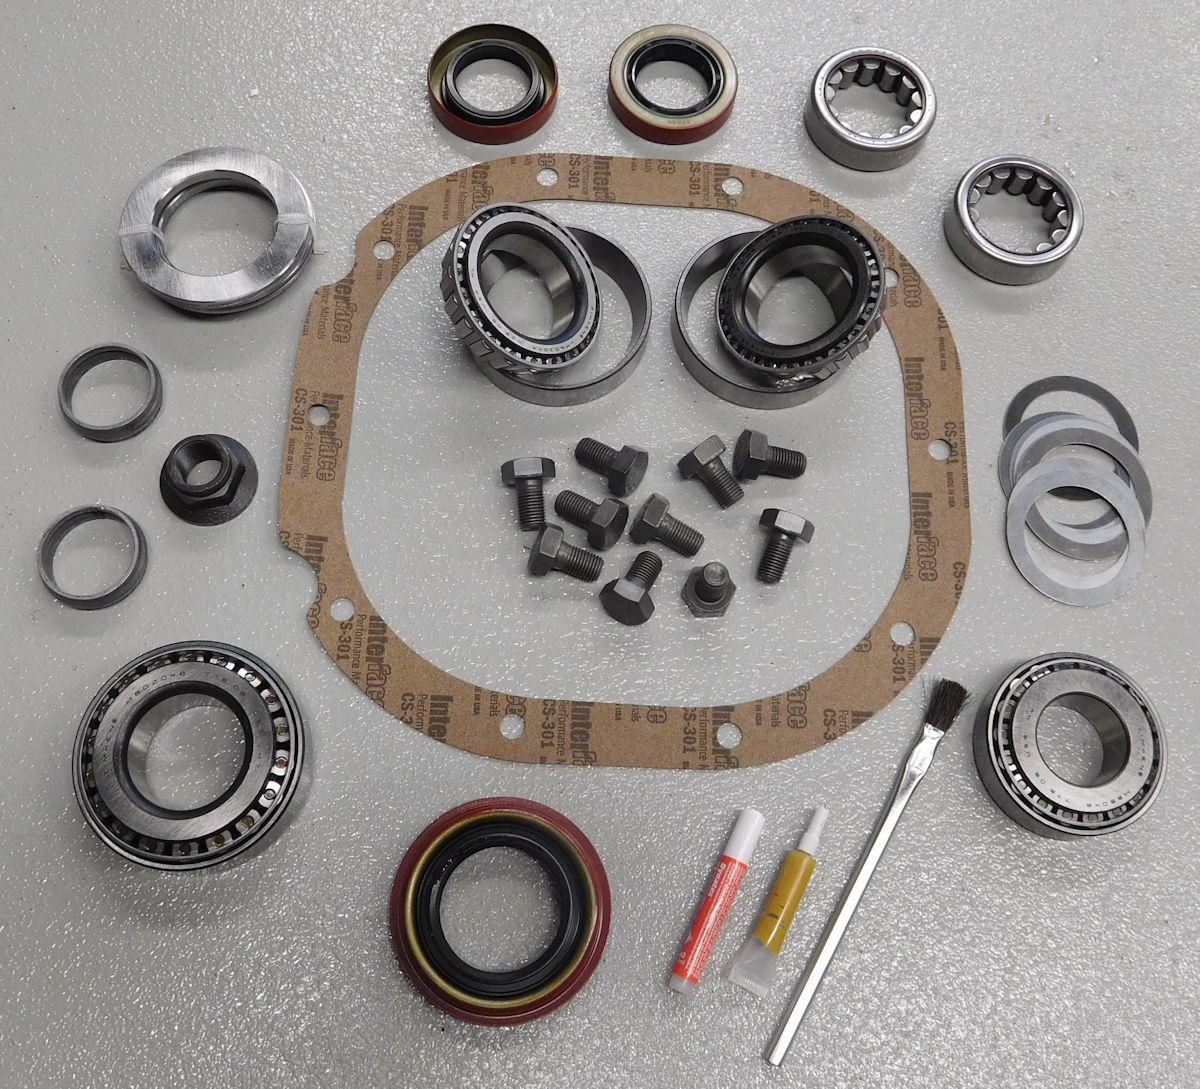 hight resolution of 8 8 rear axle super rebuild kit